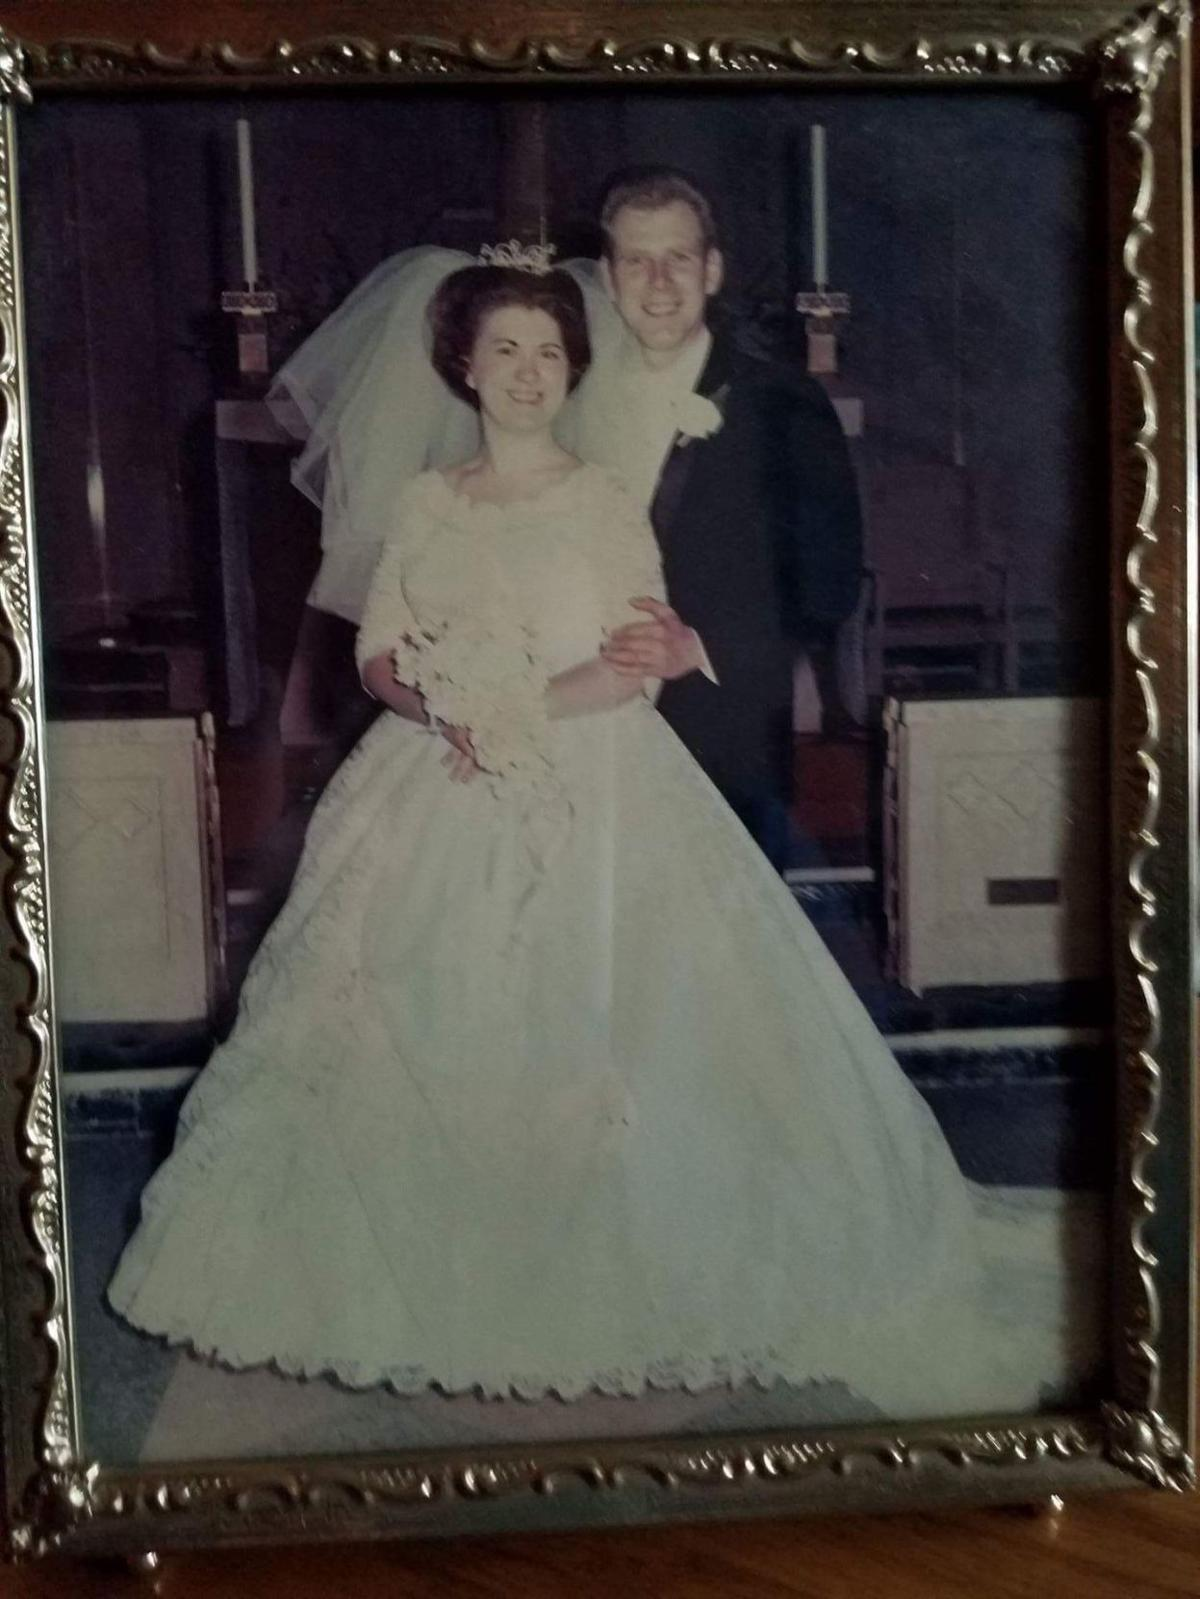 Happy 50th wedding anniversary!